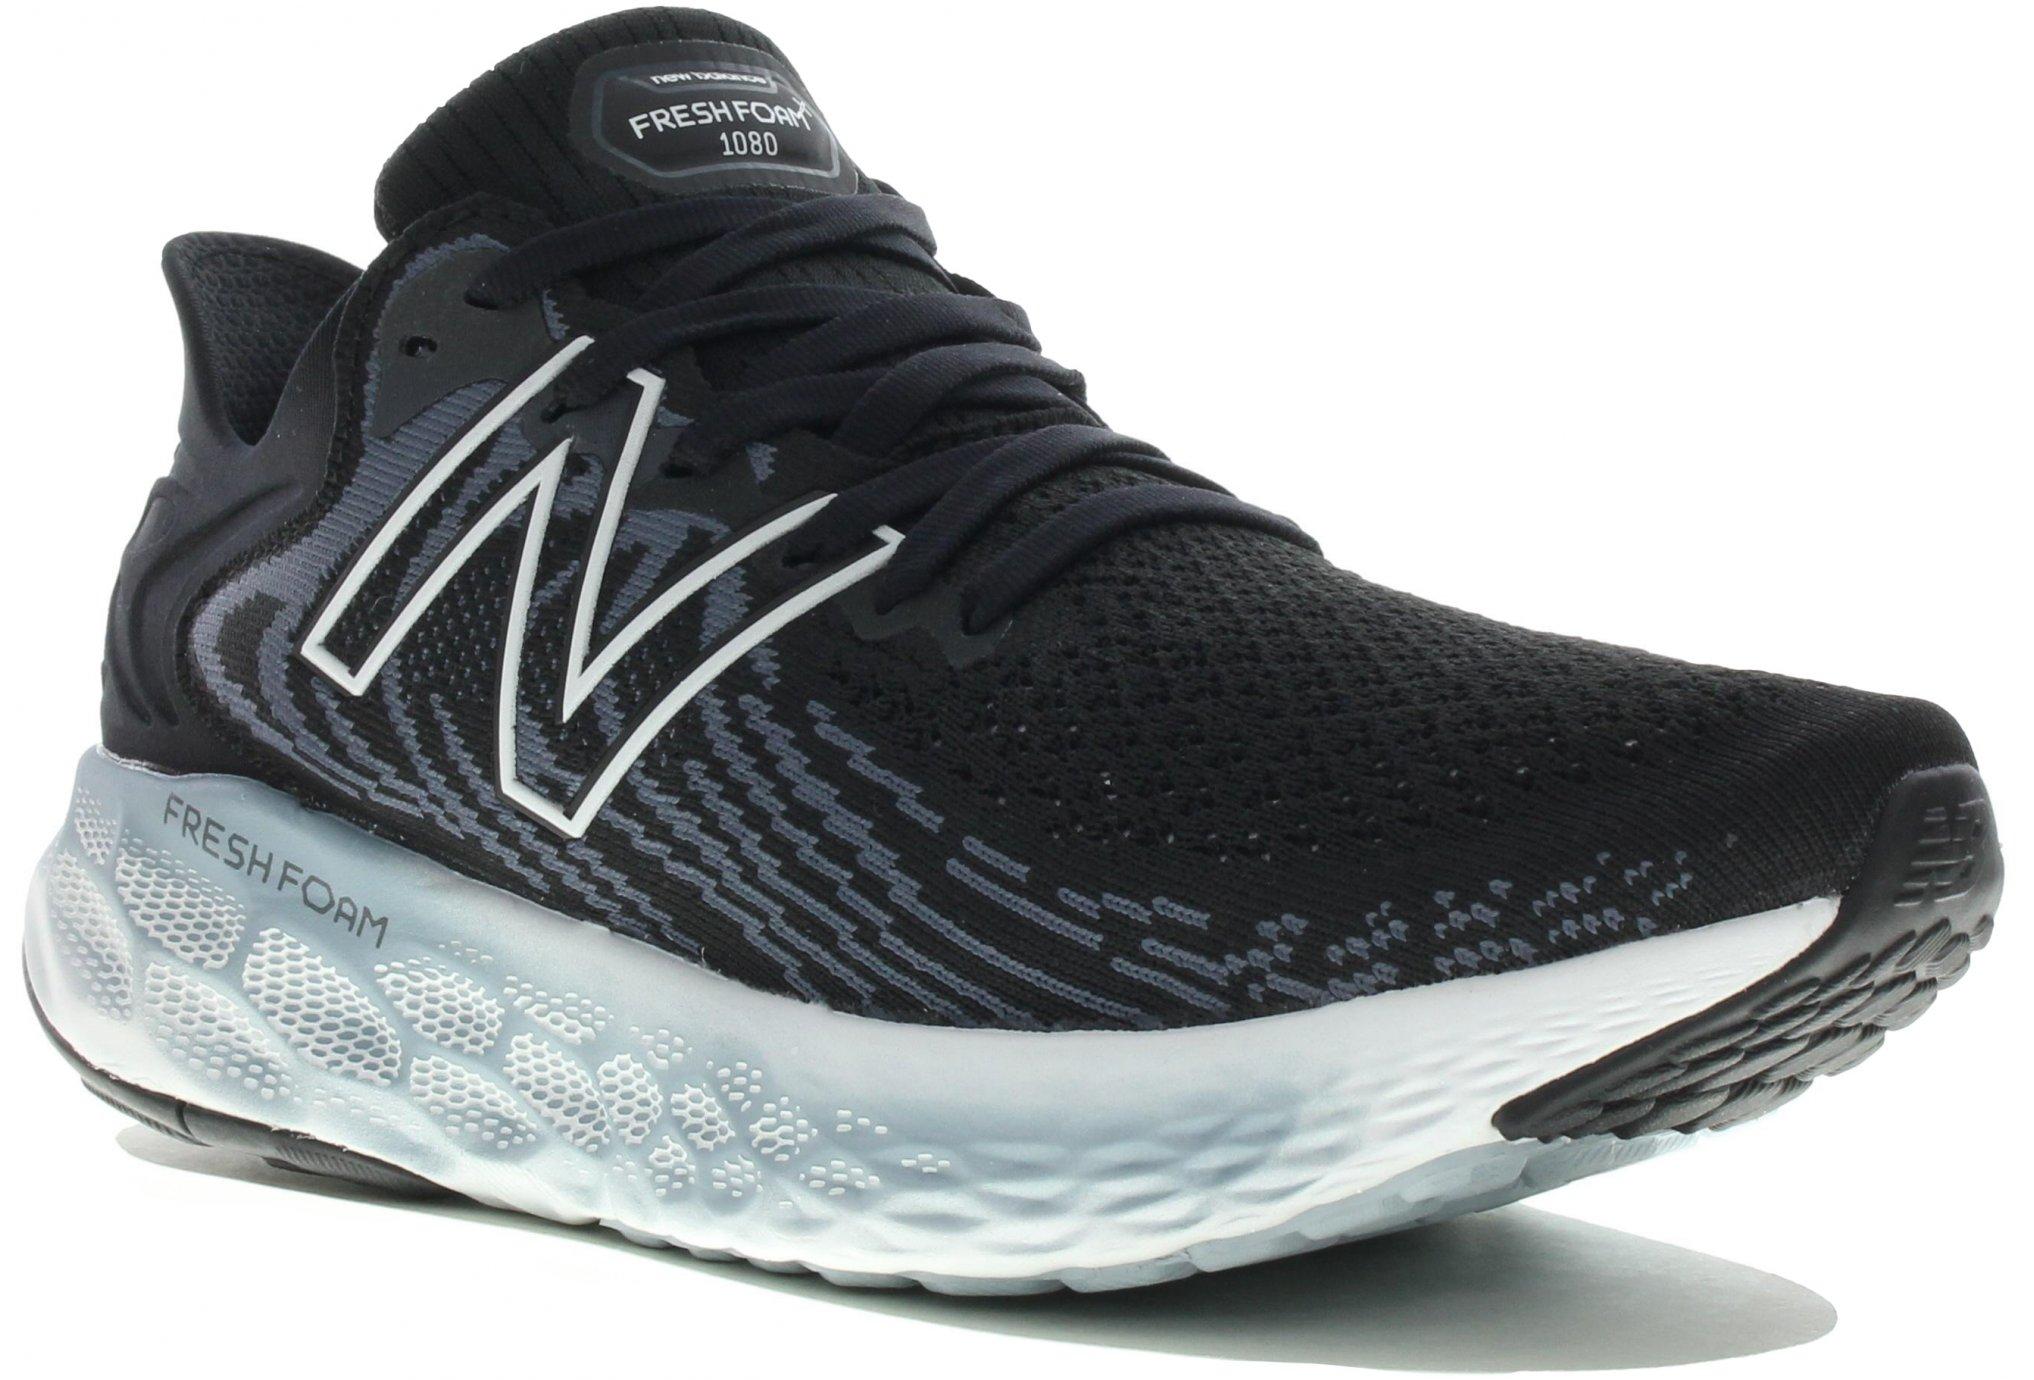 New Balance Fresh Foam W 1080 V11 Chaussures running femme